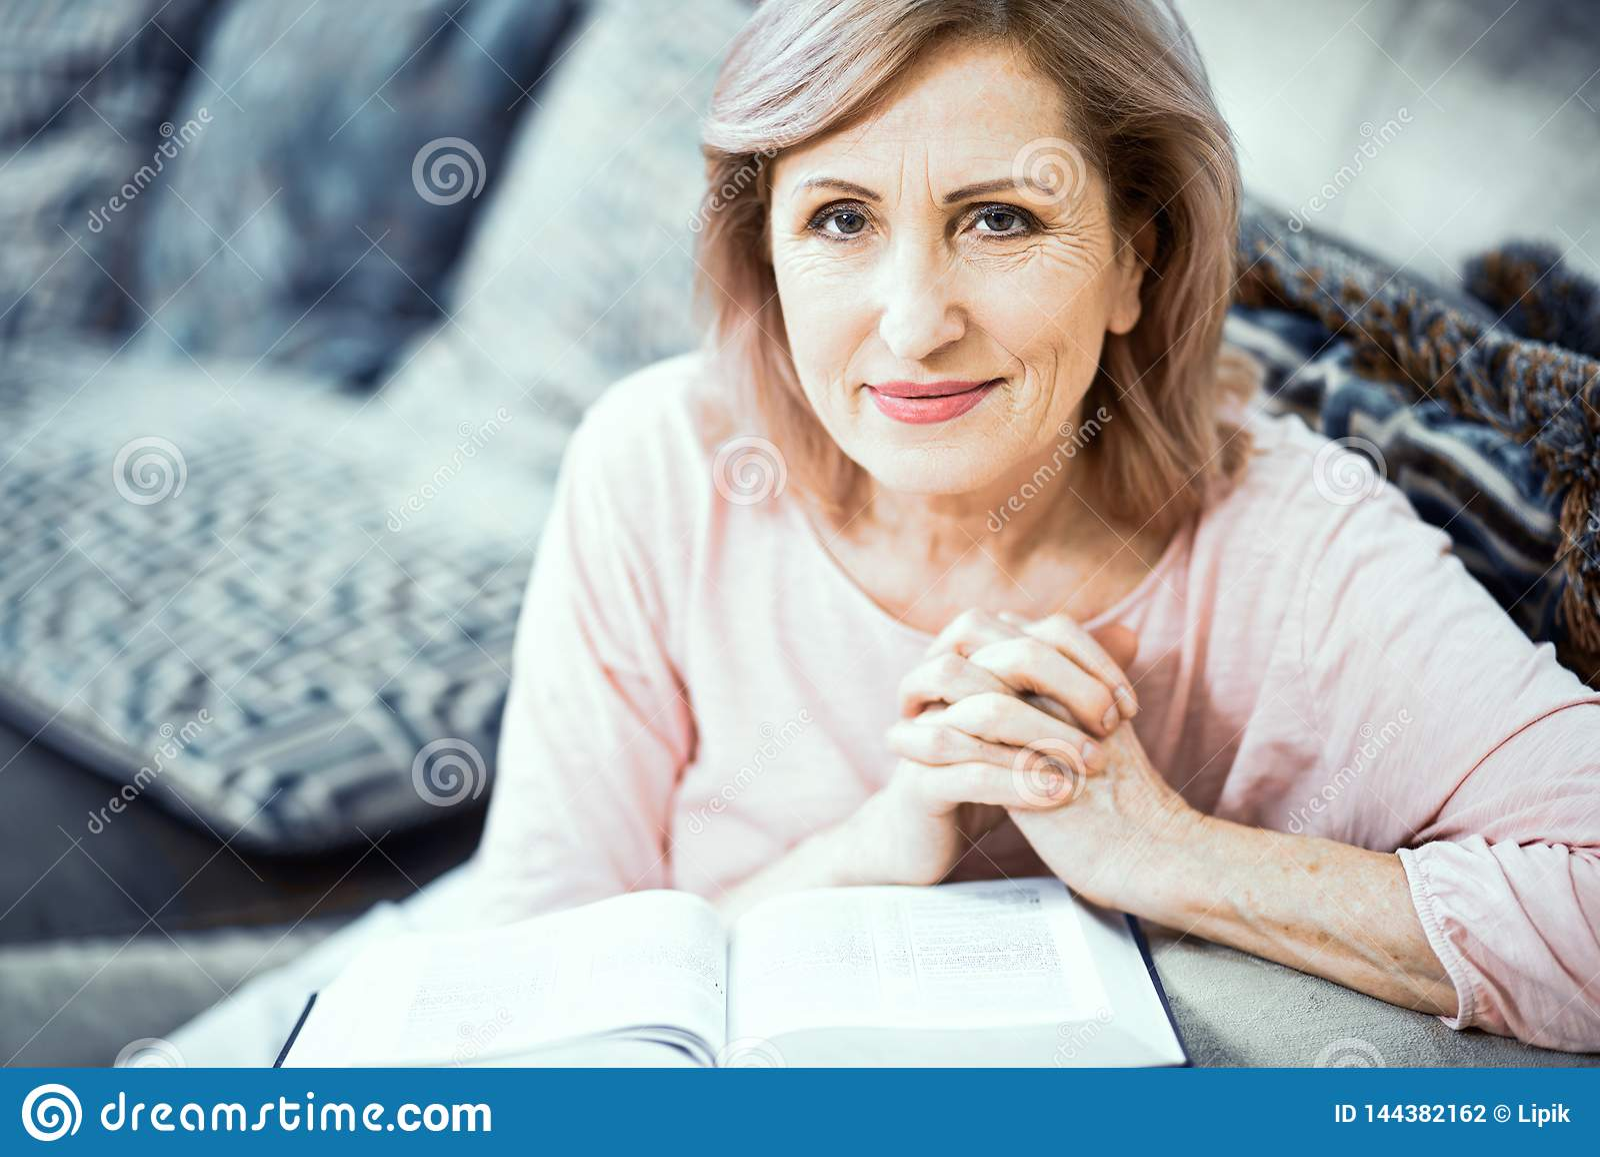 for mature beauty books women